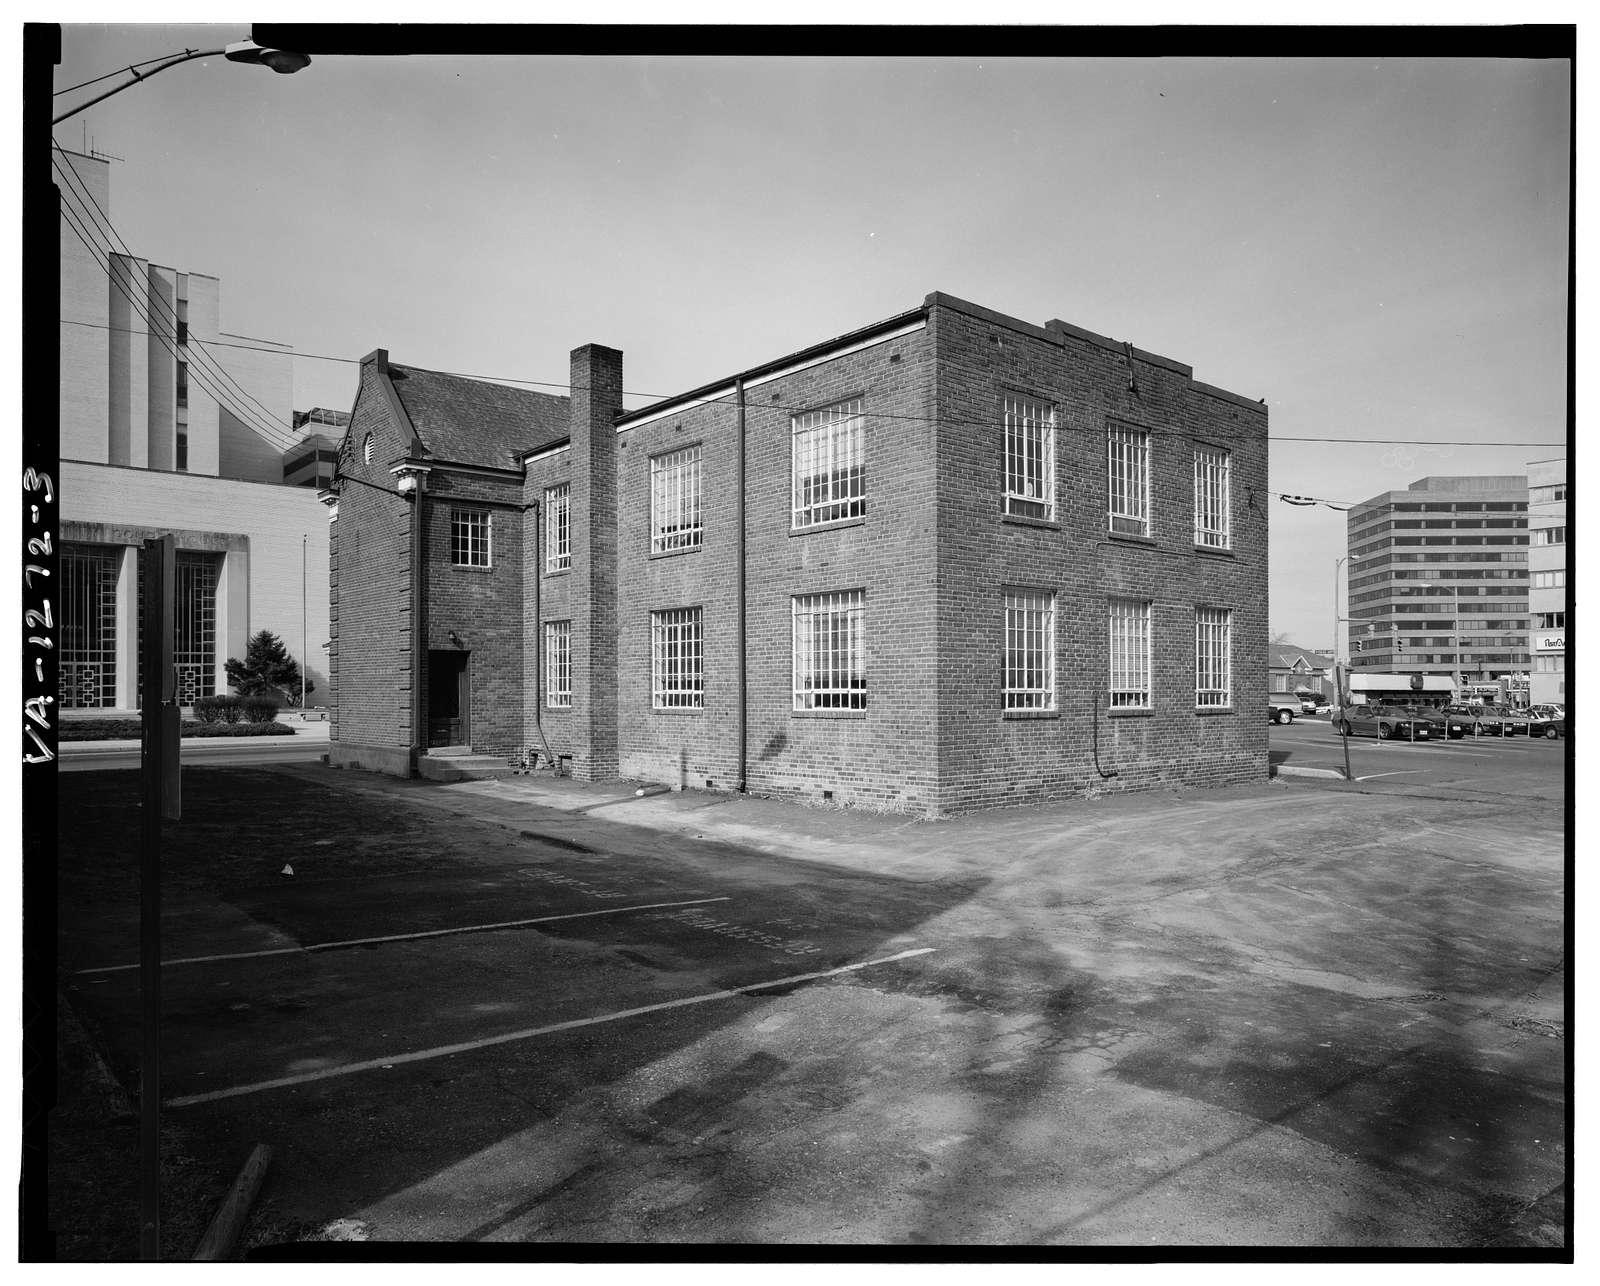 Ball Building, 1437 North Court House Road, Arlington, Arlington County, VA